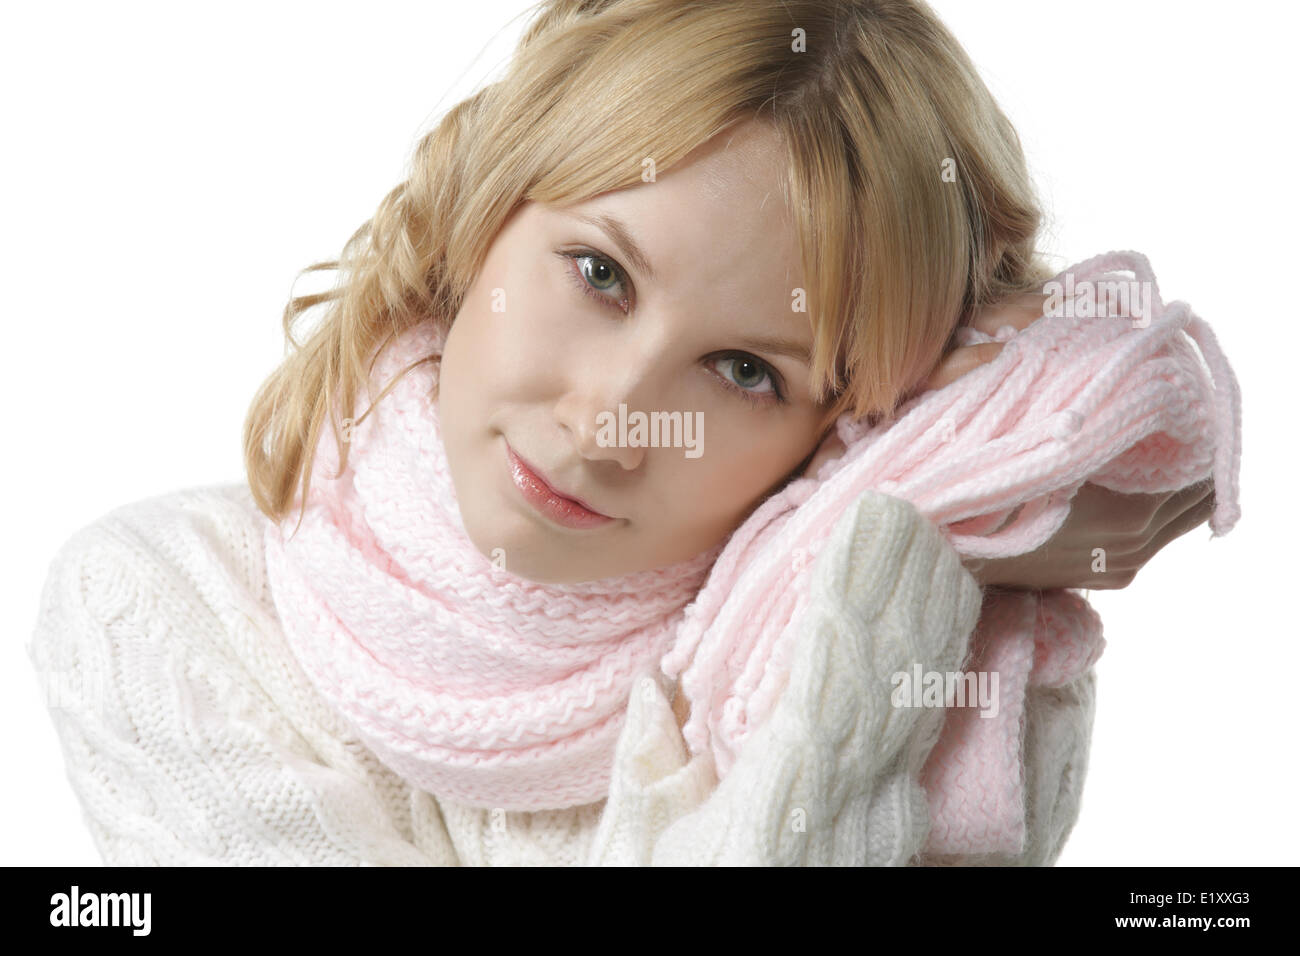 Softness - Stock Image